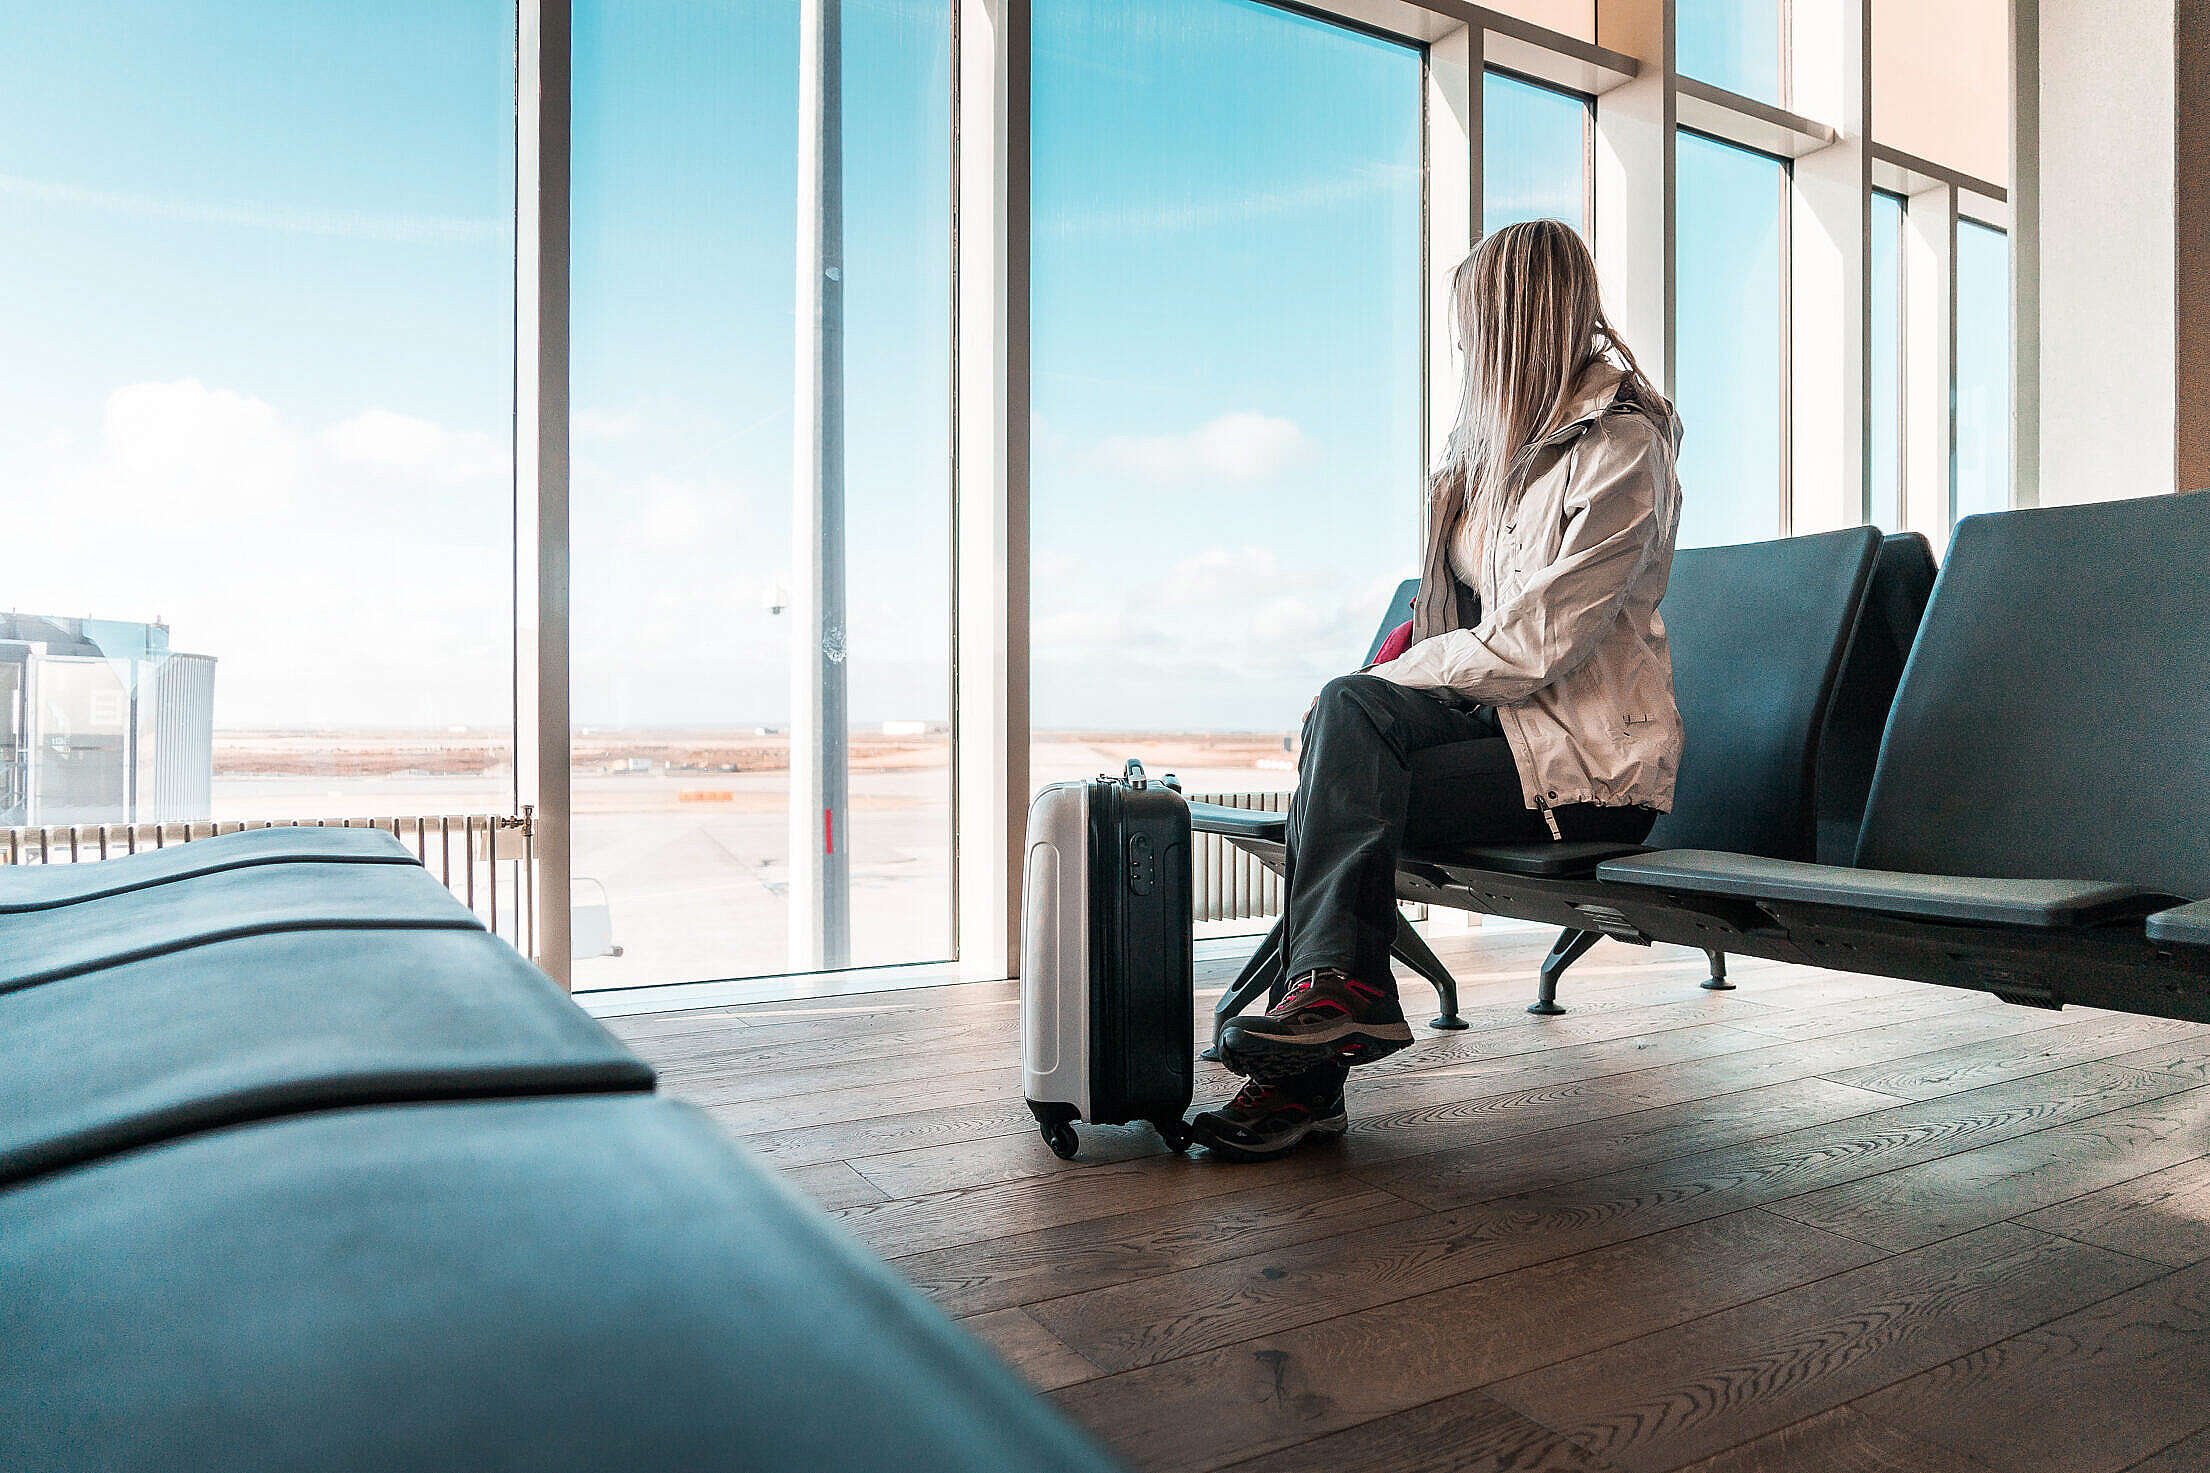 Woman Traveler Waiting at Icelandic Airport Free Stock Photo